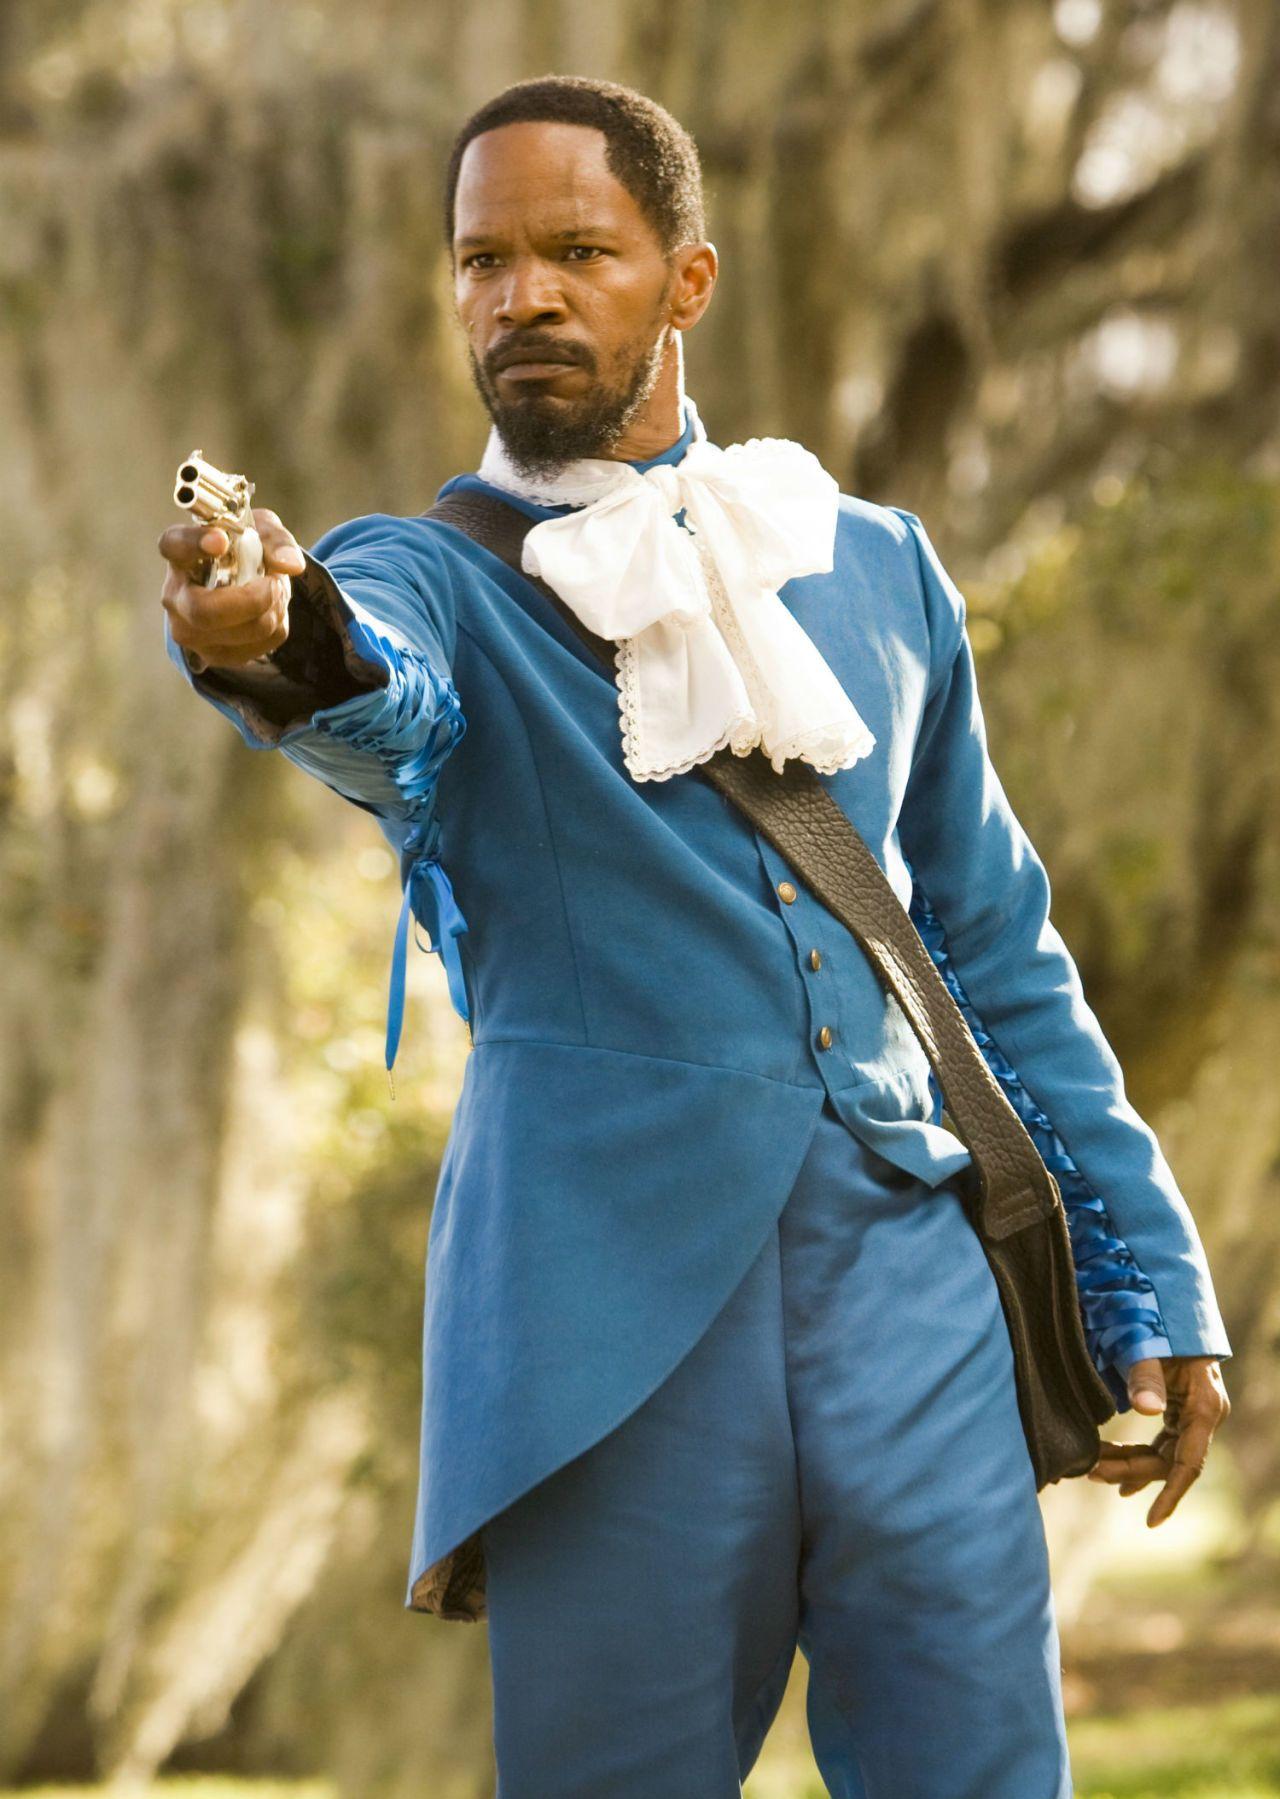 Quentin Tarantino To Make A Django Unchained/Zorro Crossover Film